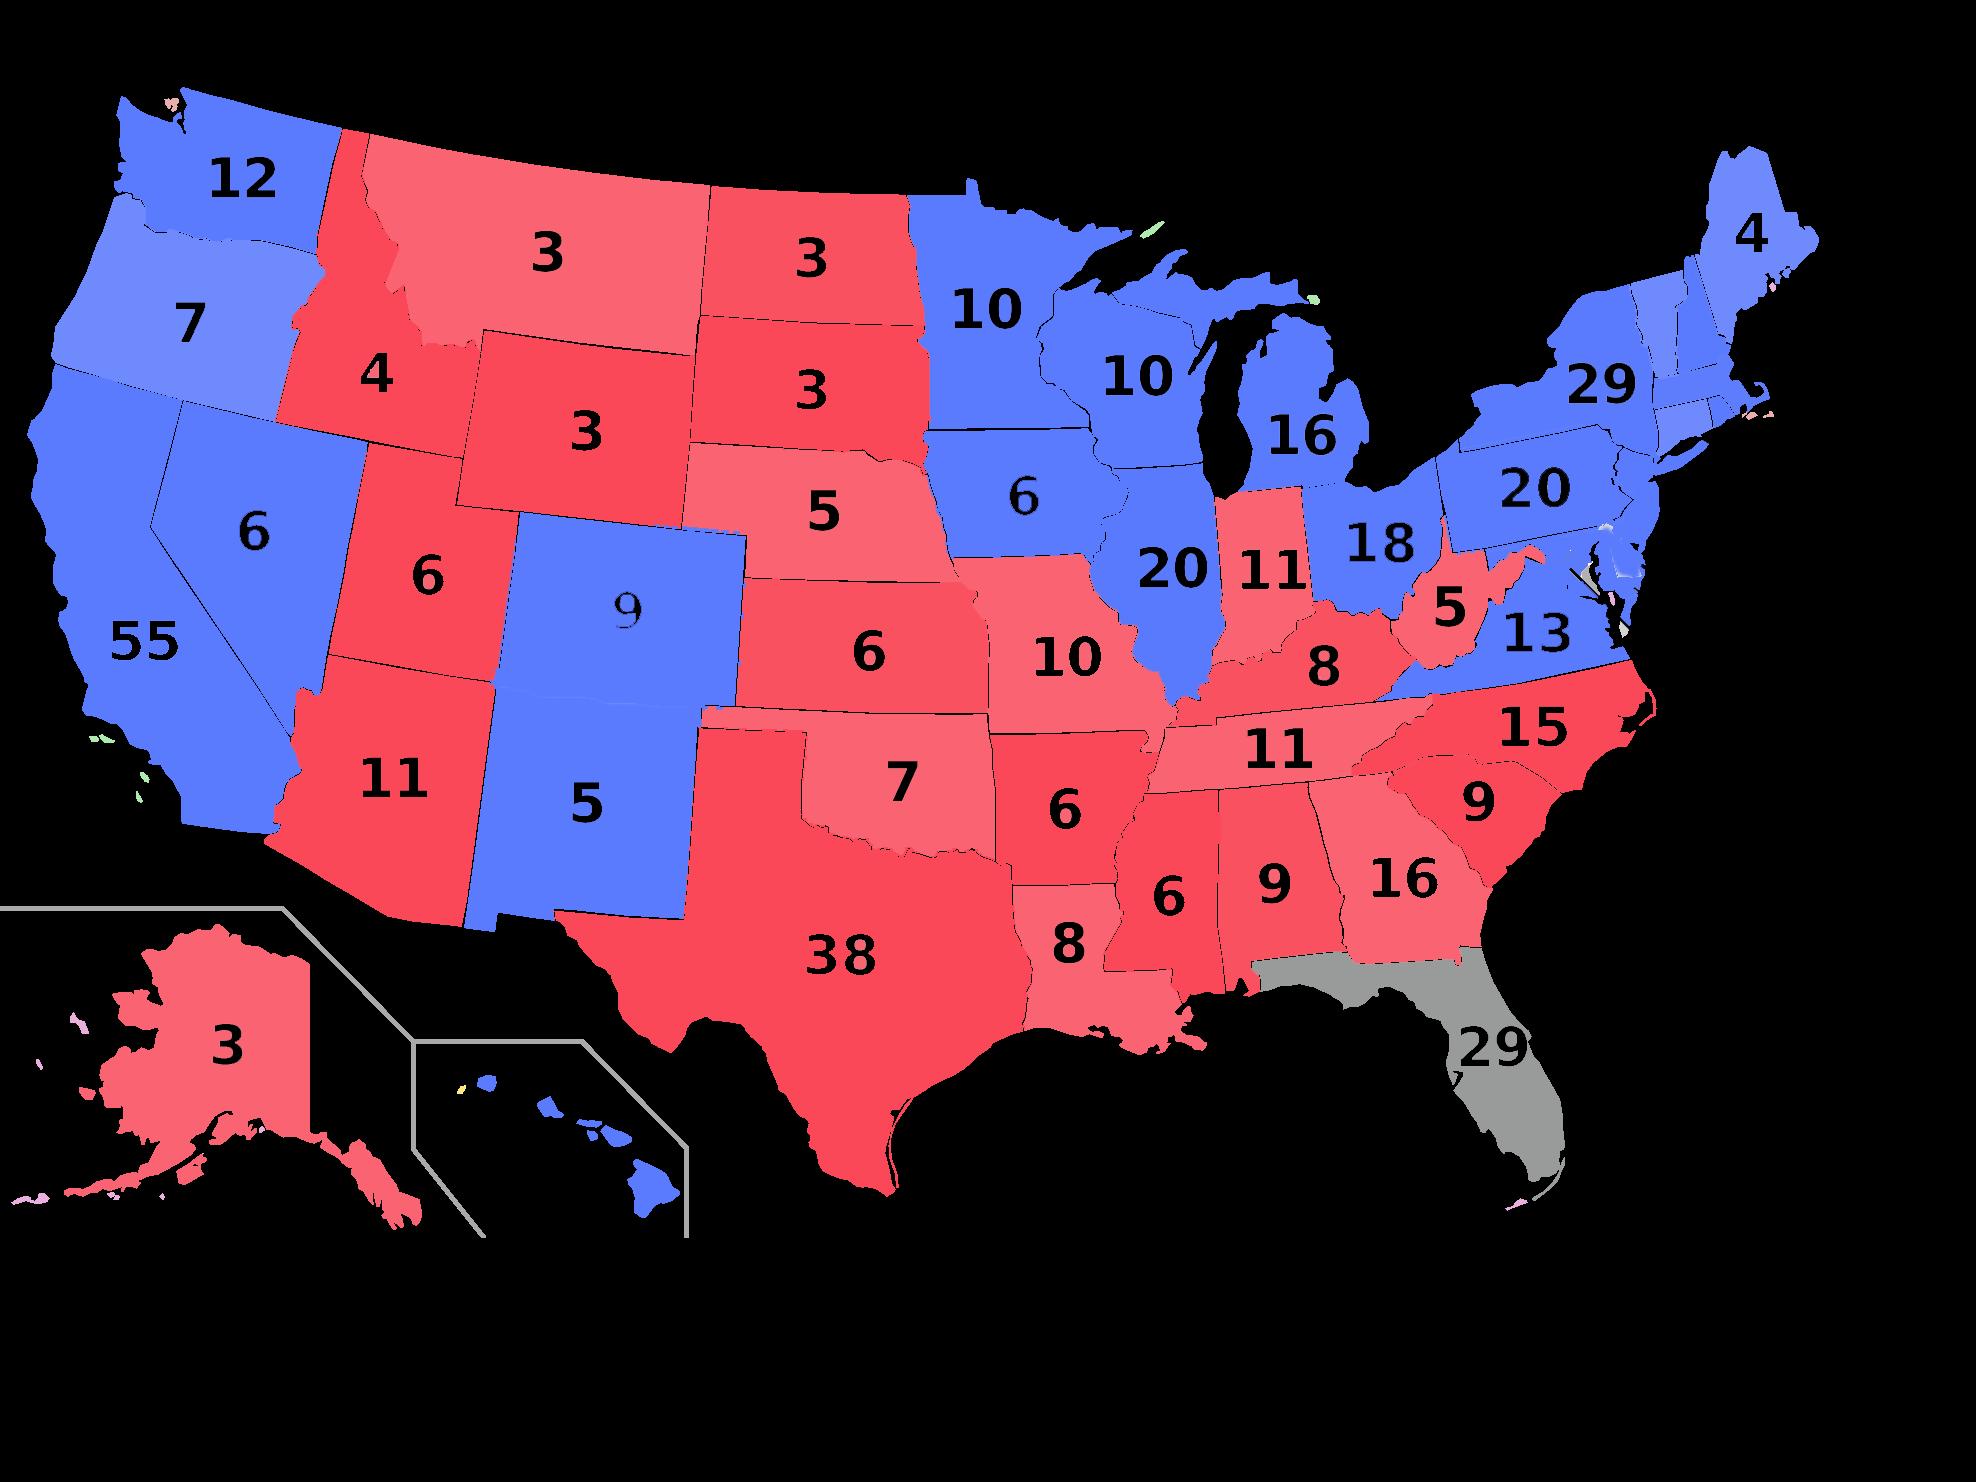 Total Votes In Electoral College Electoral Map